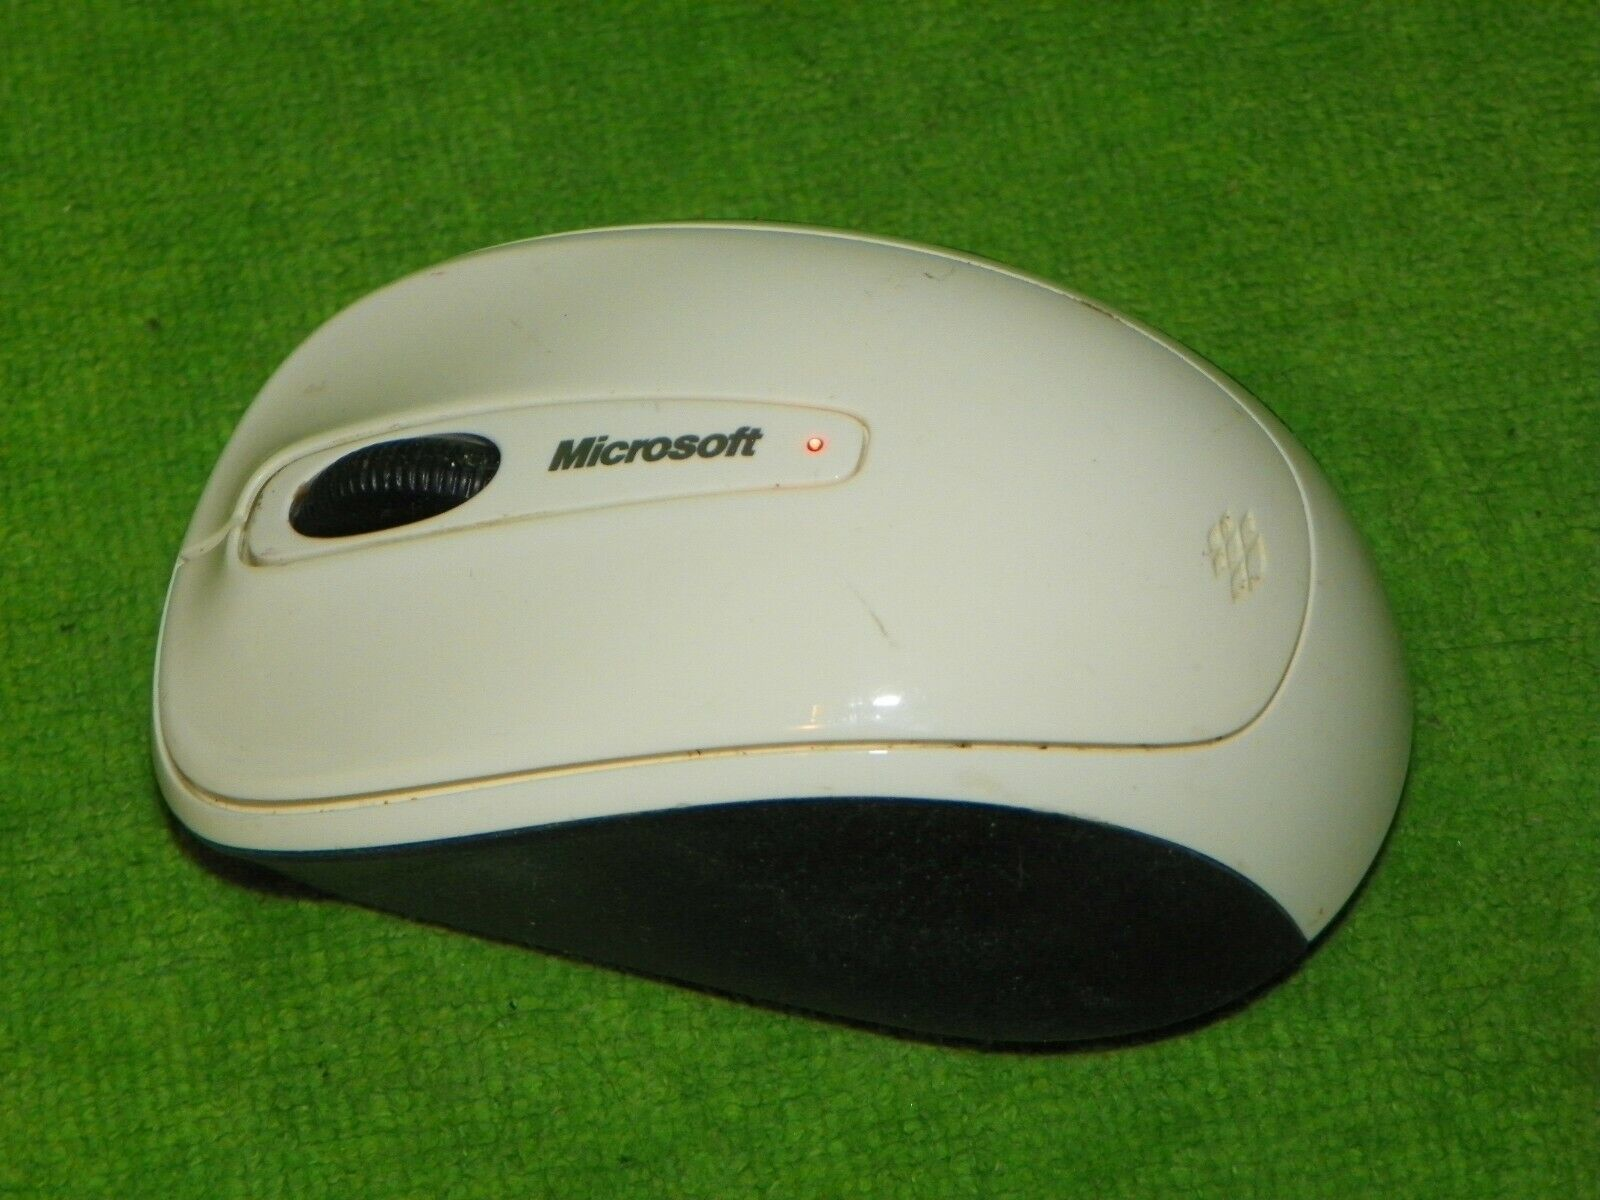 Genuine OEM Original Microsoft Wireless Mobile Mouse 3500 - White Black - $6.99